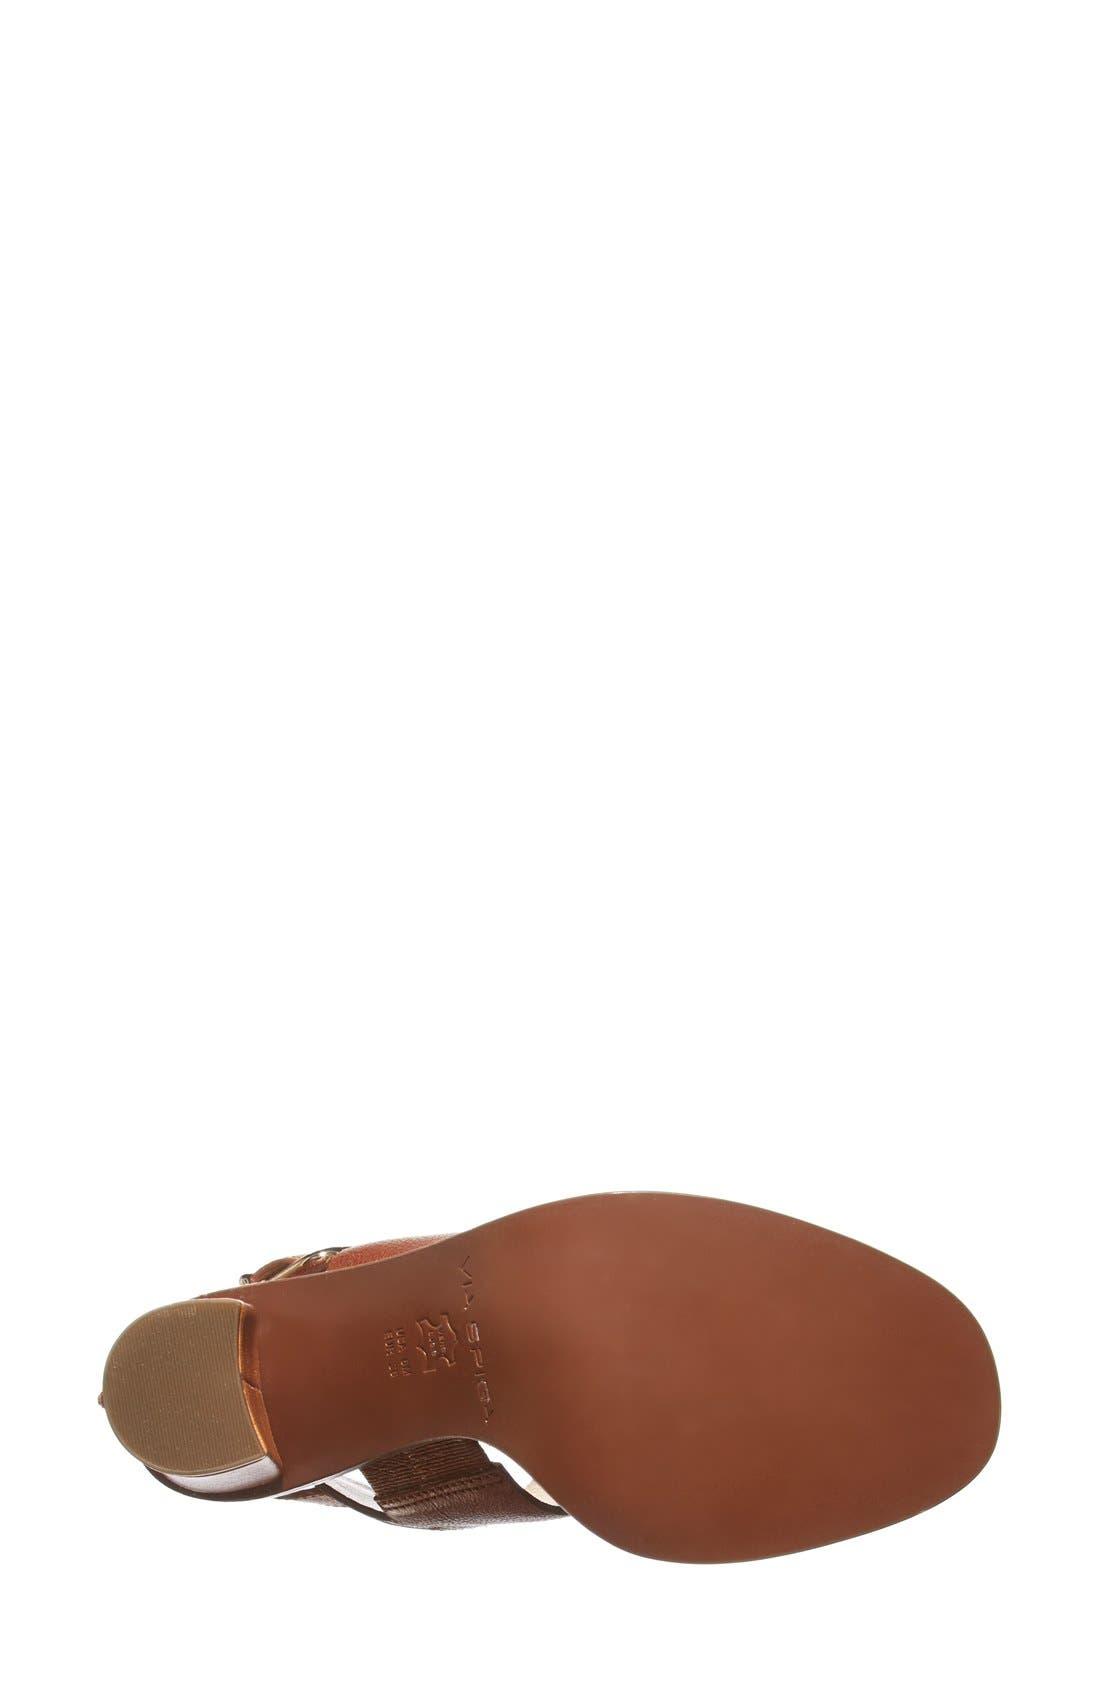 Alternate Image 4  - Via Spiga 'Baris' Leather Slingback Sandal (Women) (Nordstrom Exclusive)